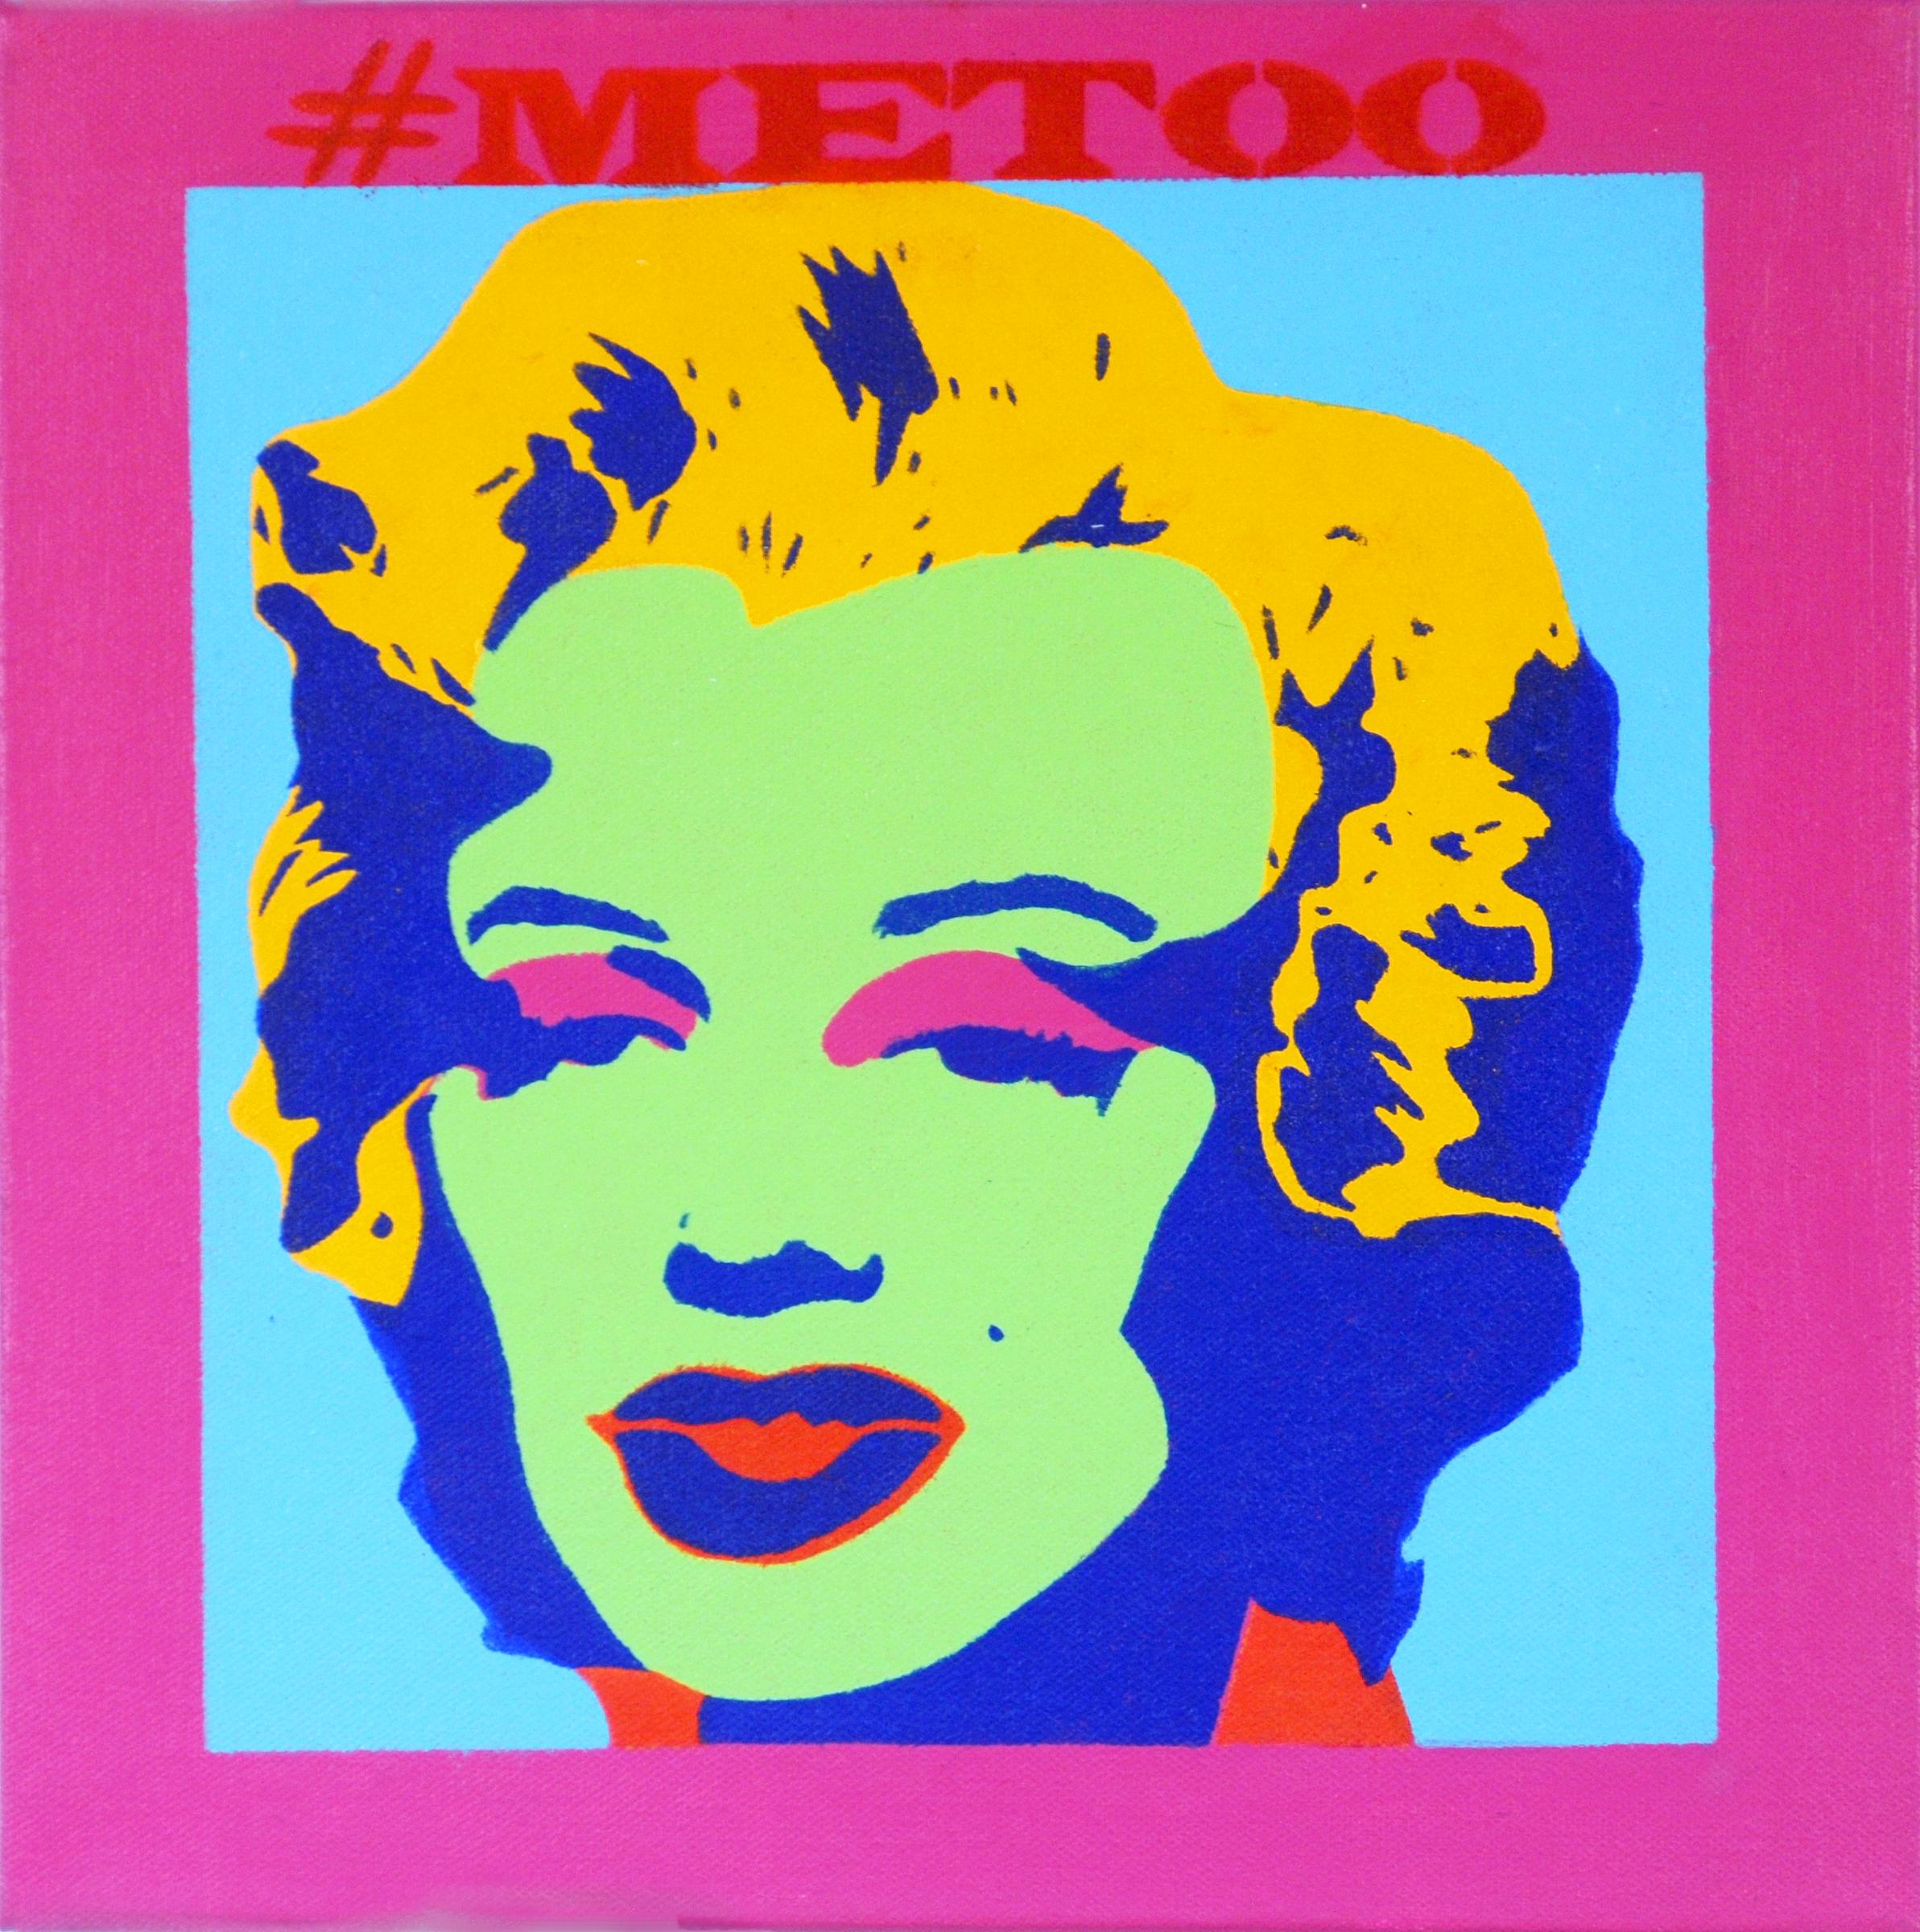 "#MeToo: Marilyn #2. 2018. 12""x12""."